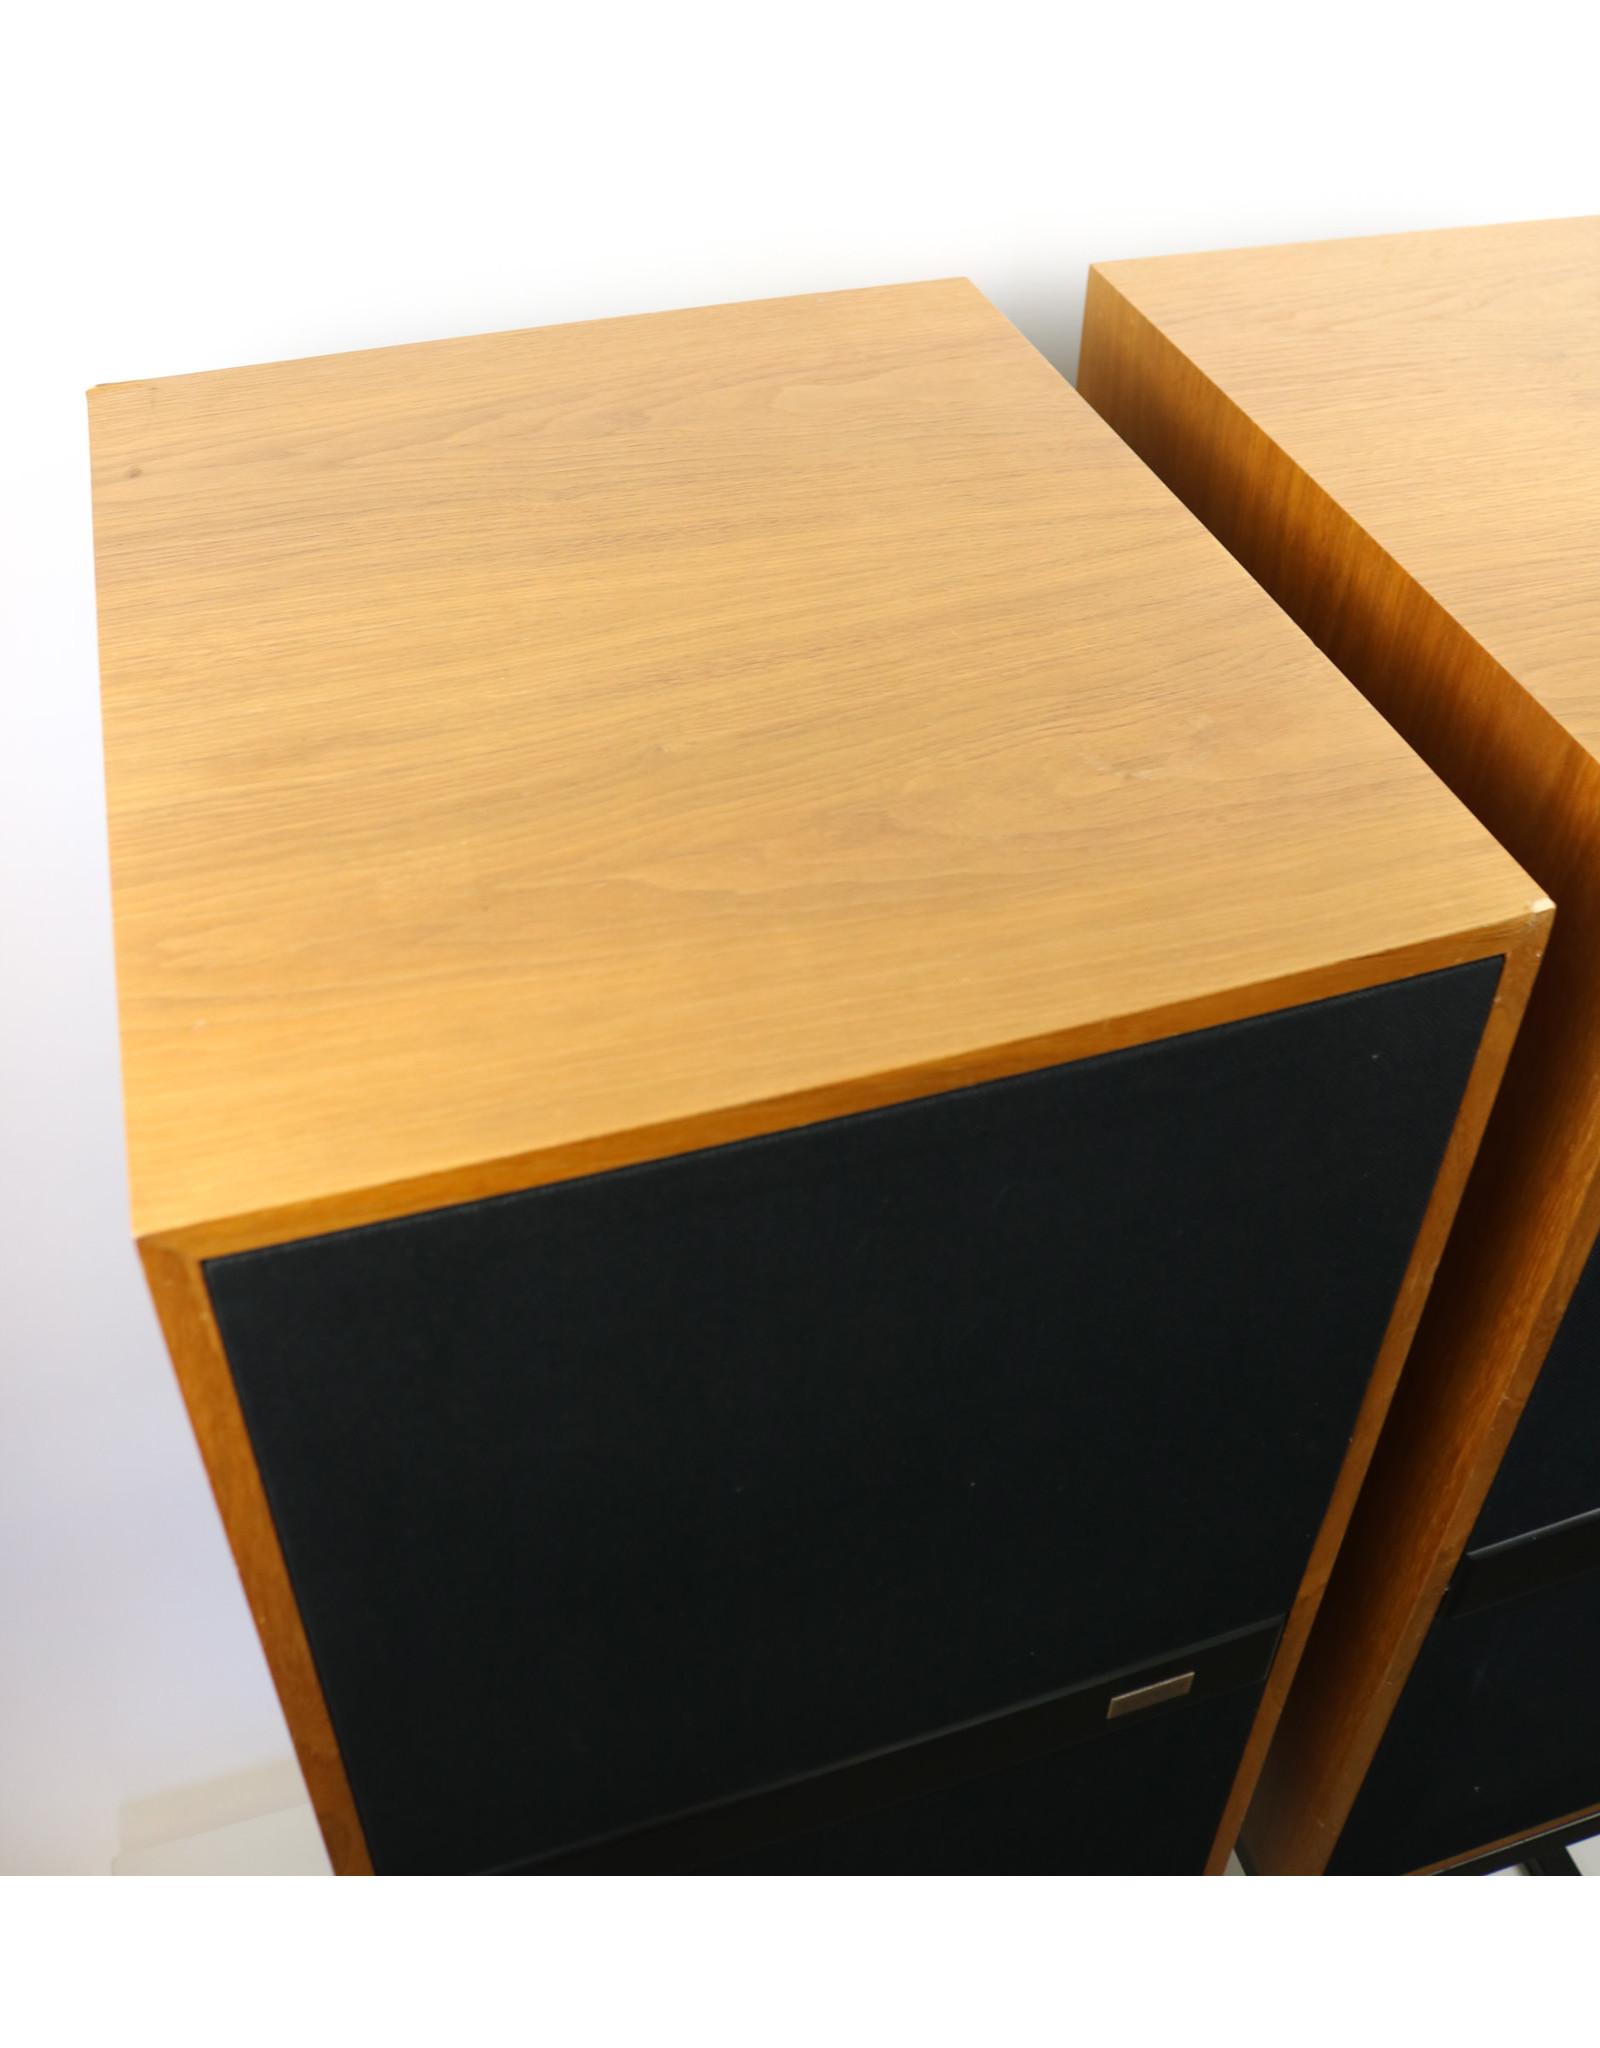 Spendor Spendor S100 Standmount Speakers USED